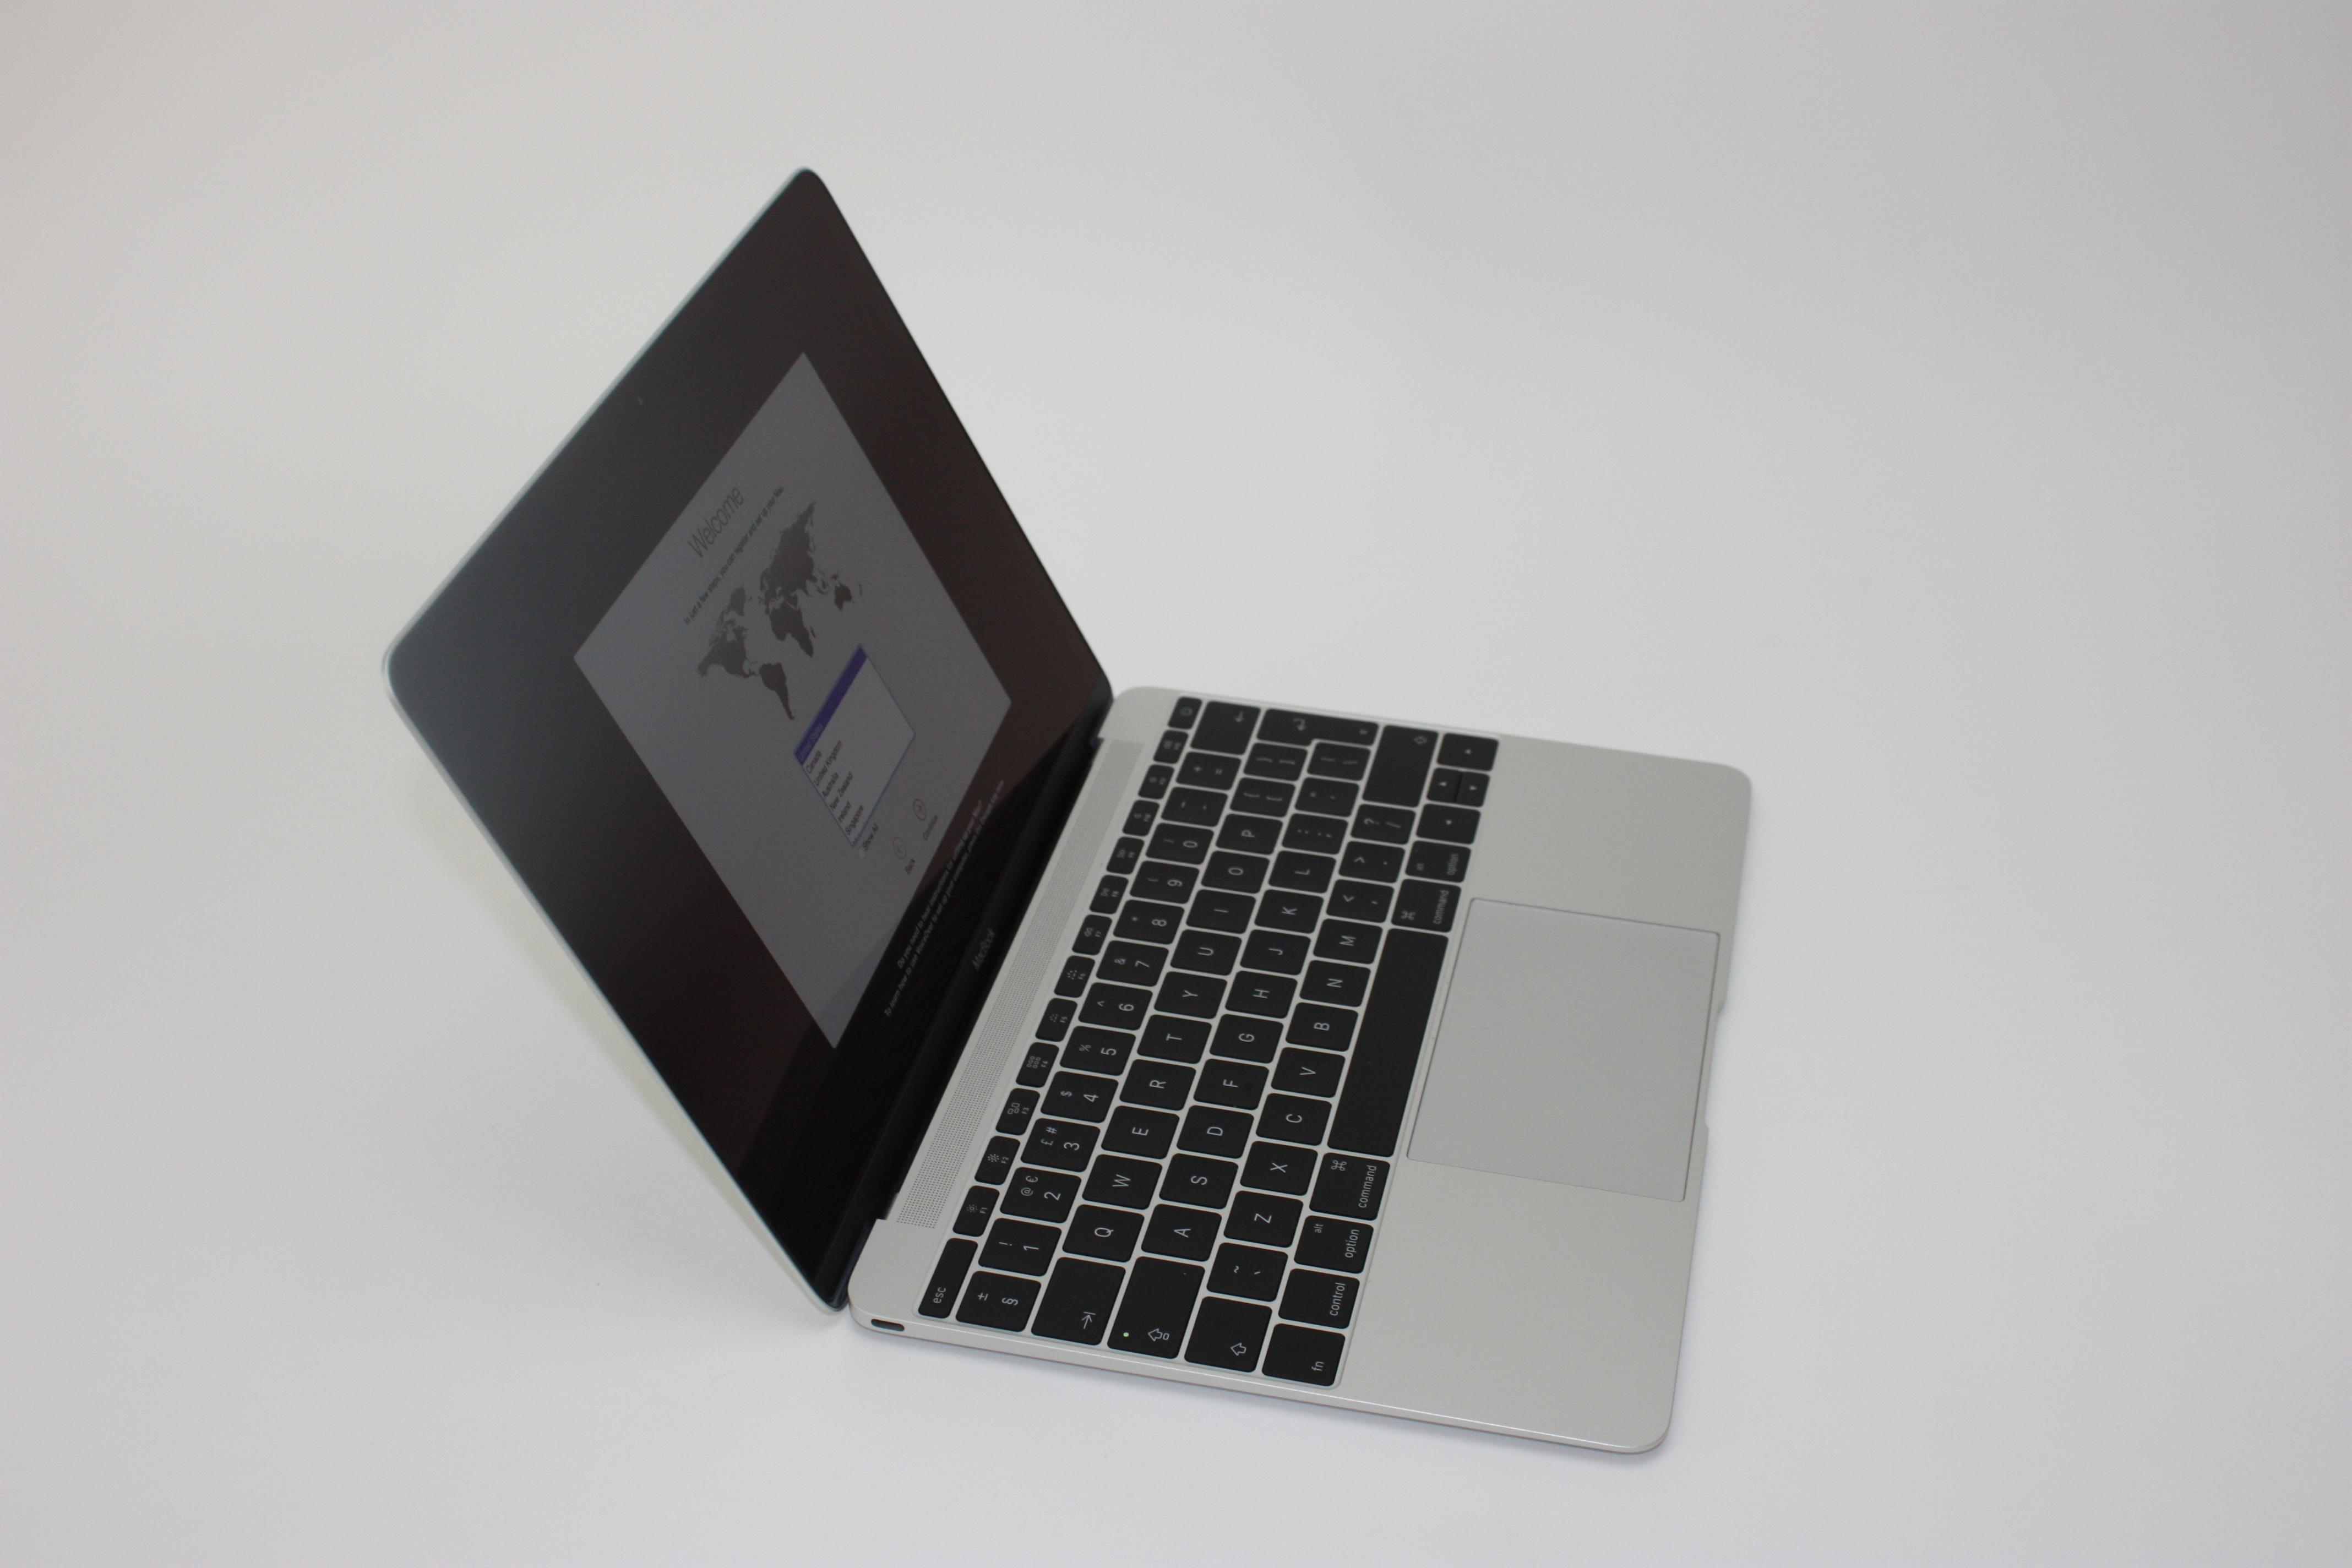 MacBook 12-inch Retina, 1.2 GHz Intel Core M, 8 GB 1600 MHz DDR3, 500 GB Flash Storage, image 3